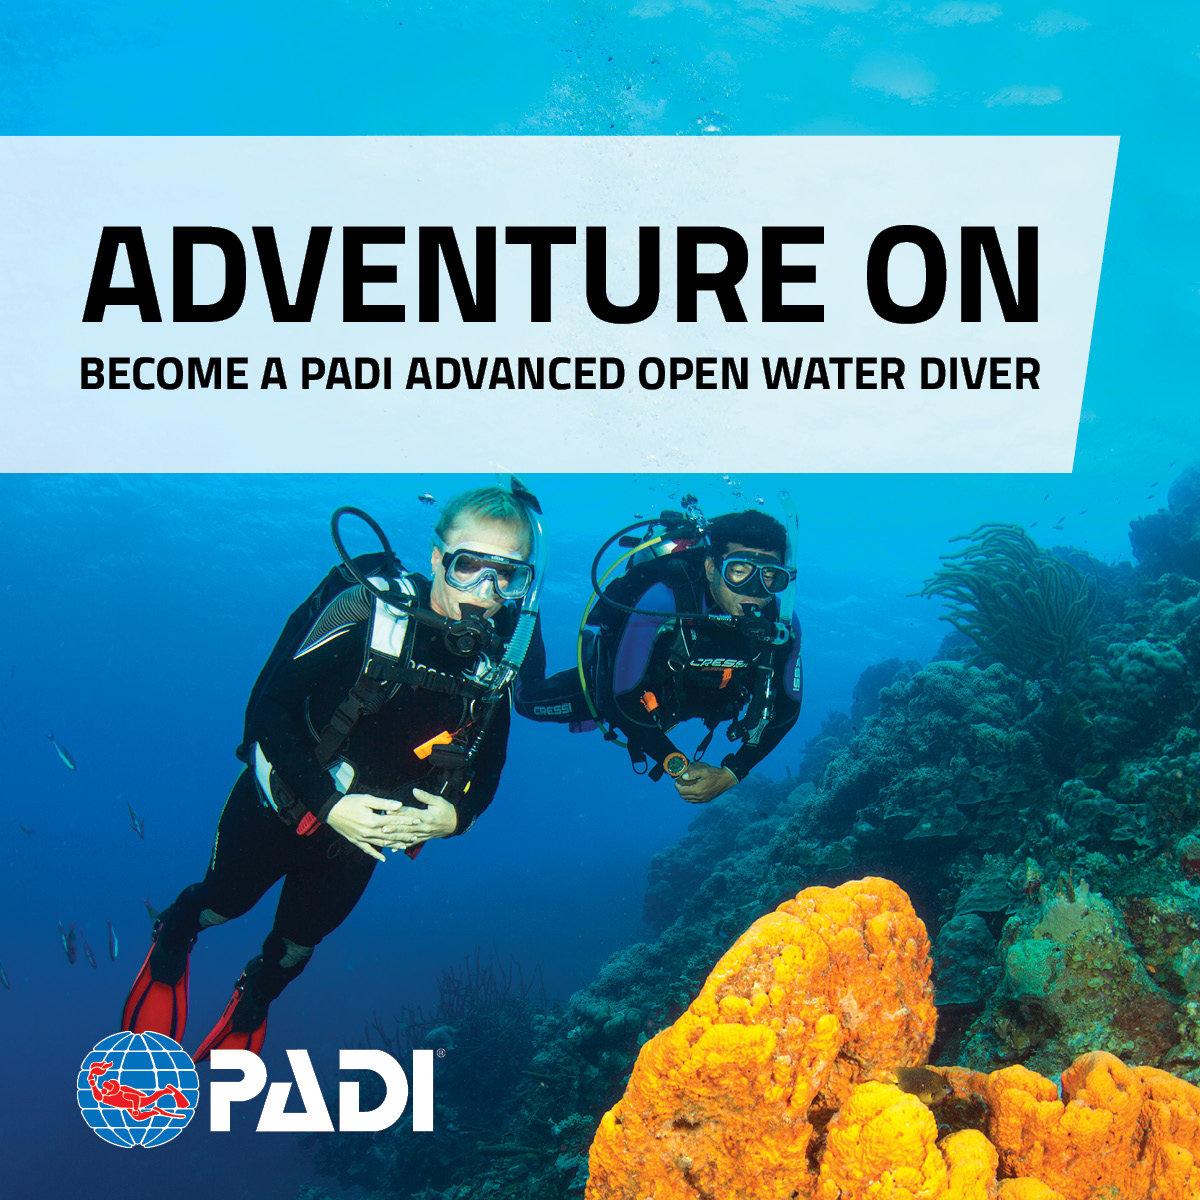 PADI - Advanced Open Water Diver